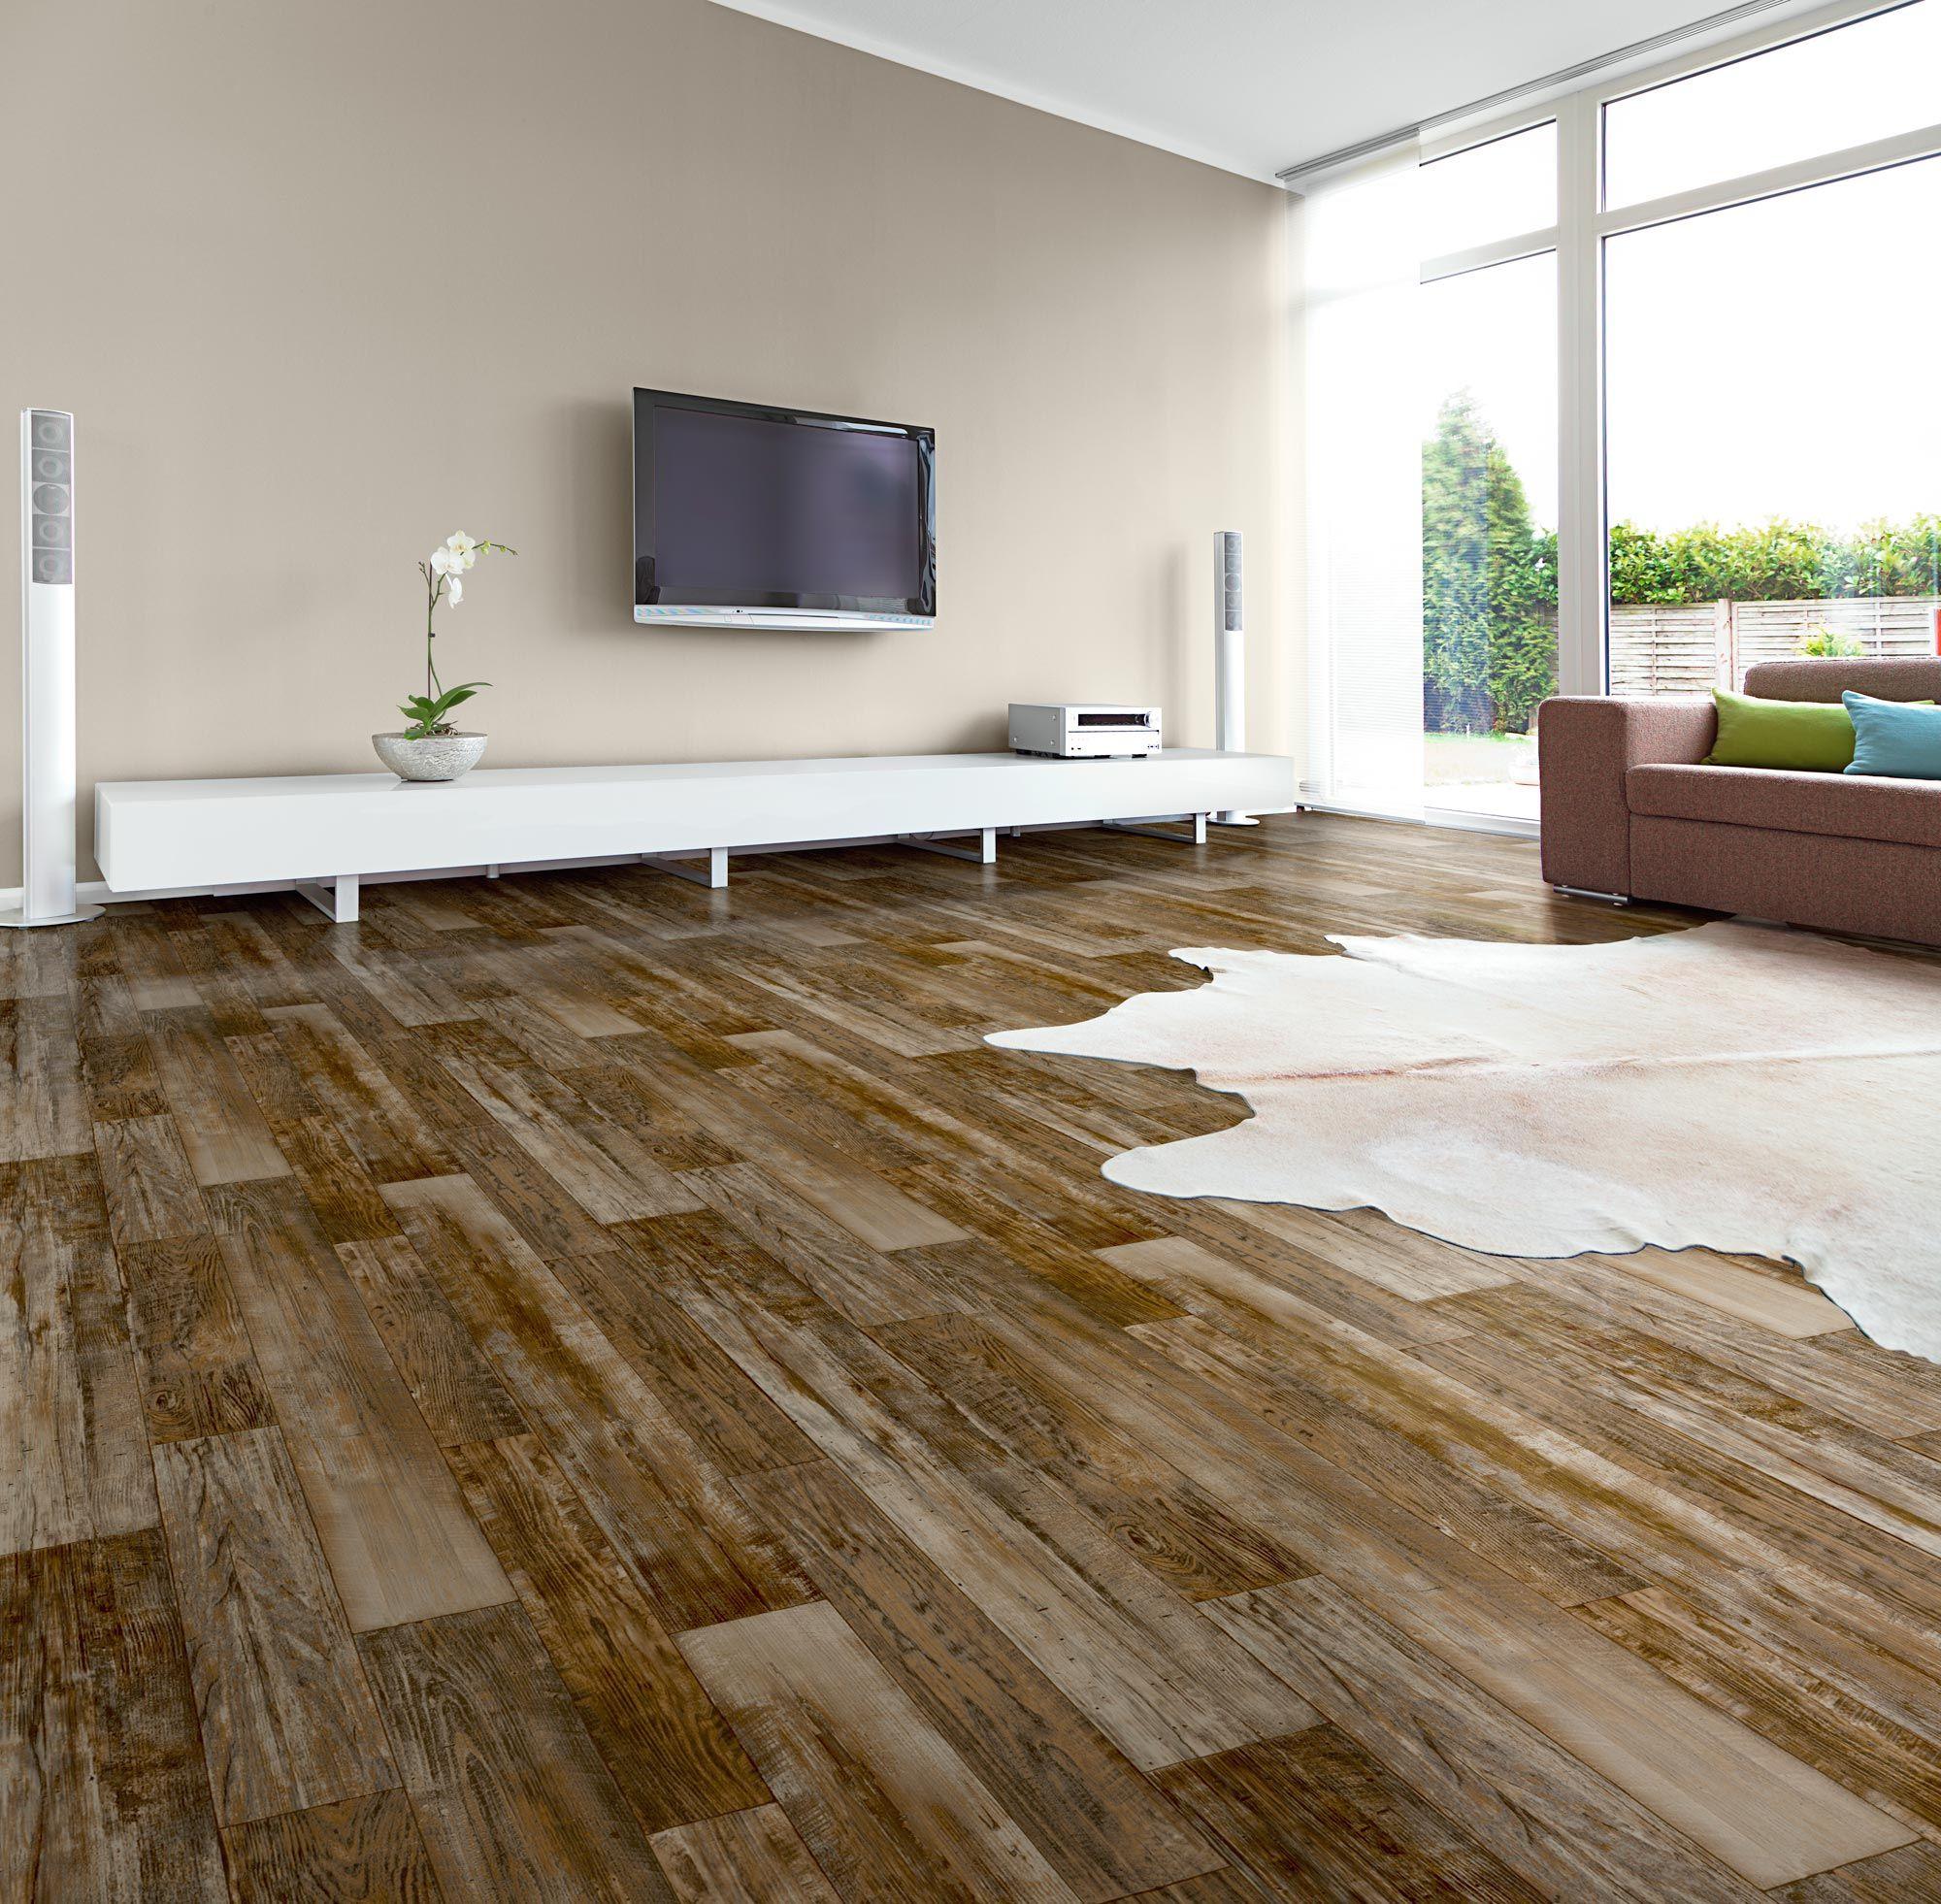 Hardwood Flooring Darien Ct: AirStep Evolution